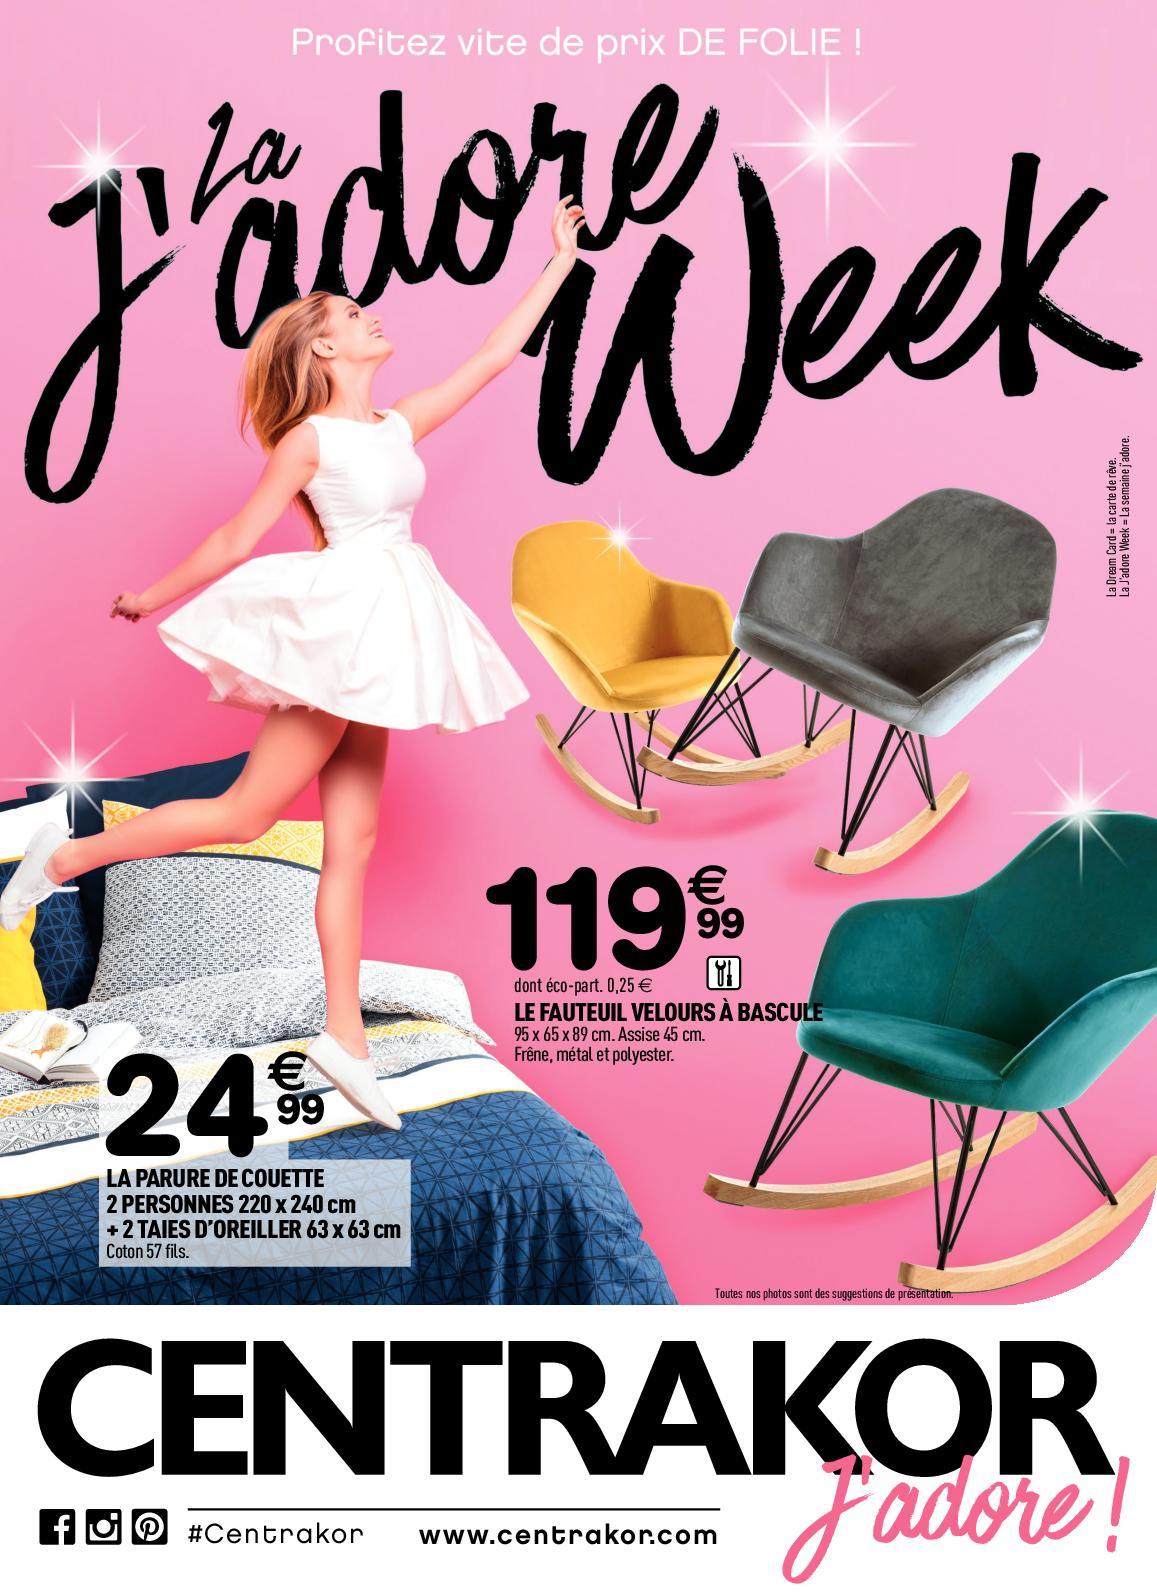 Calaméo Martinique La J'adore Week Catalogue 621 Centrakor Édition nP0wOk